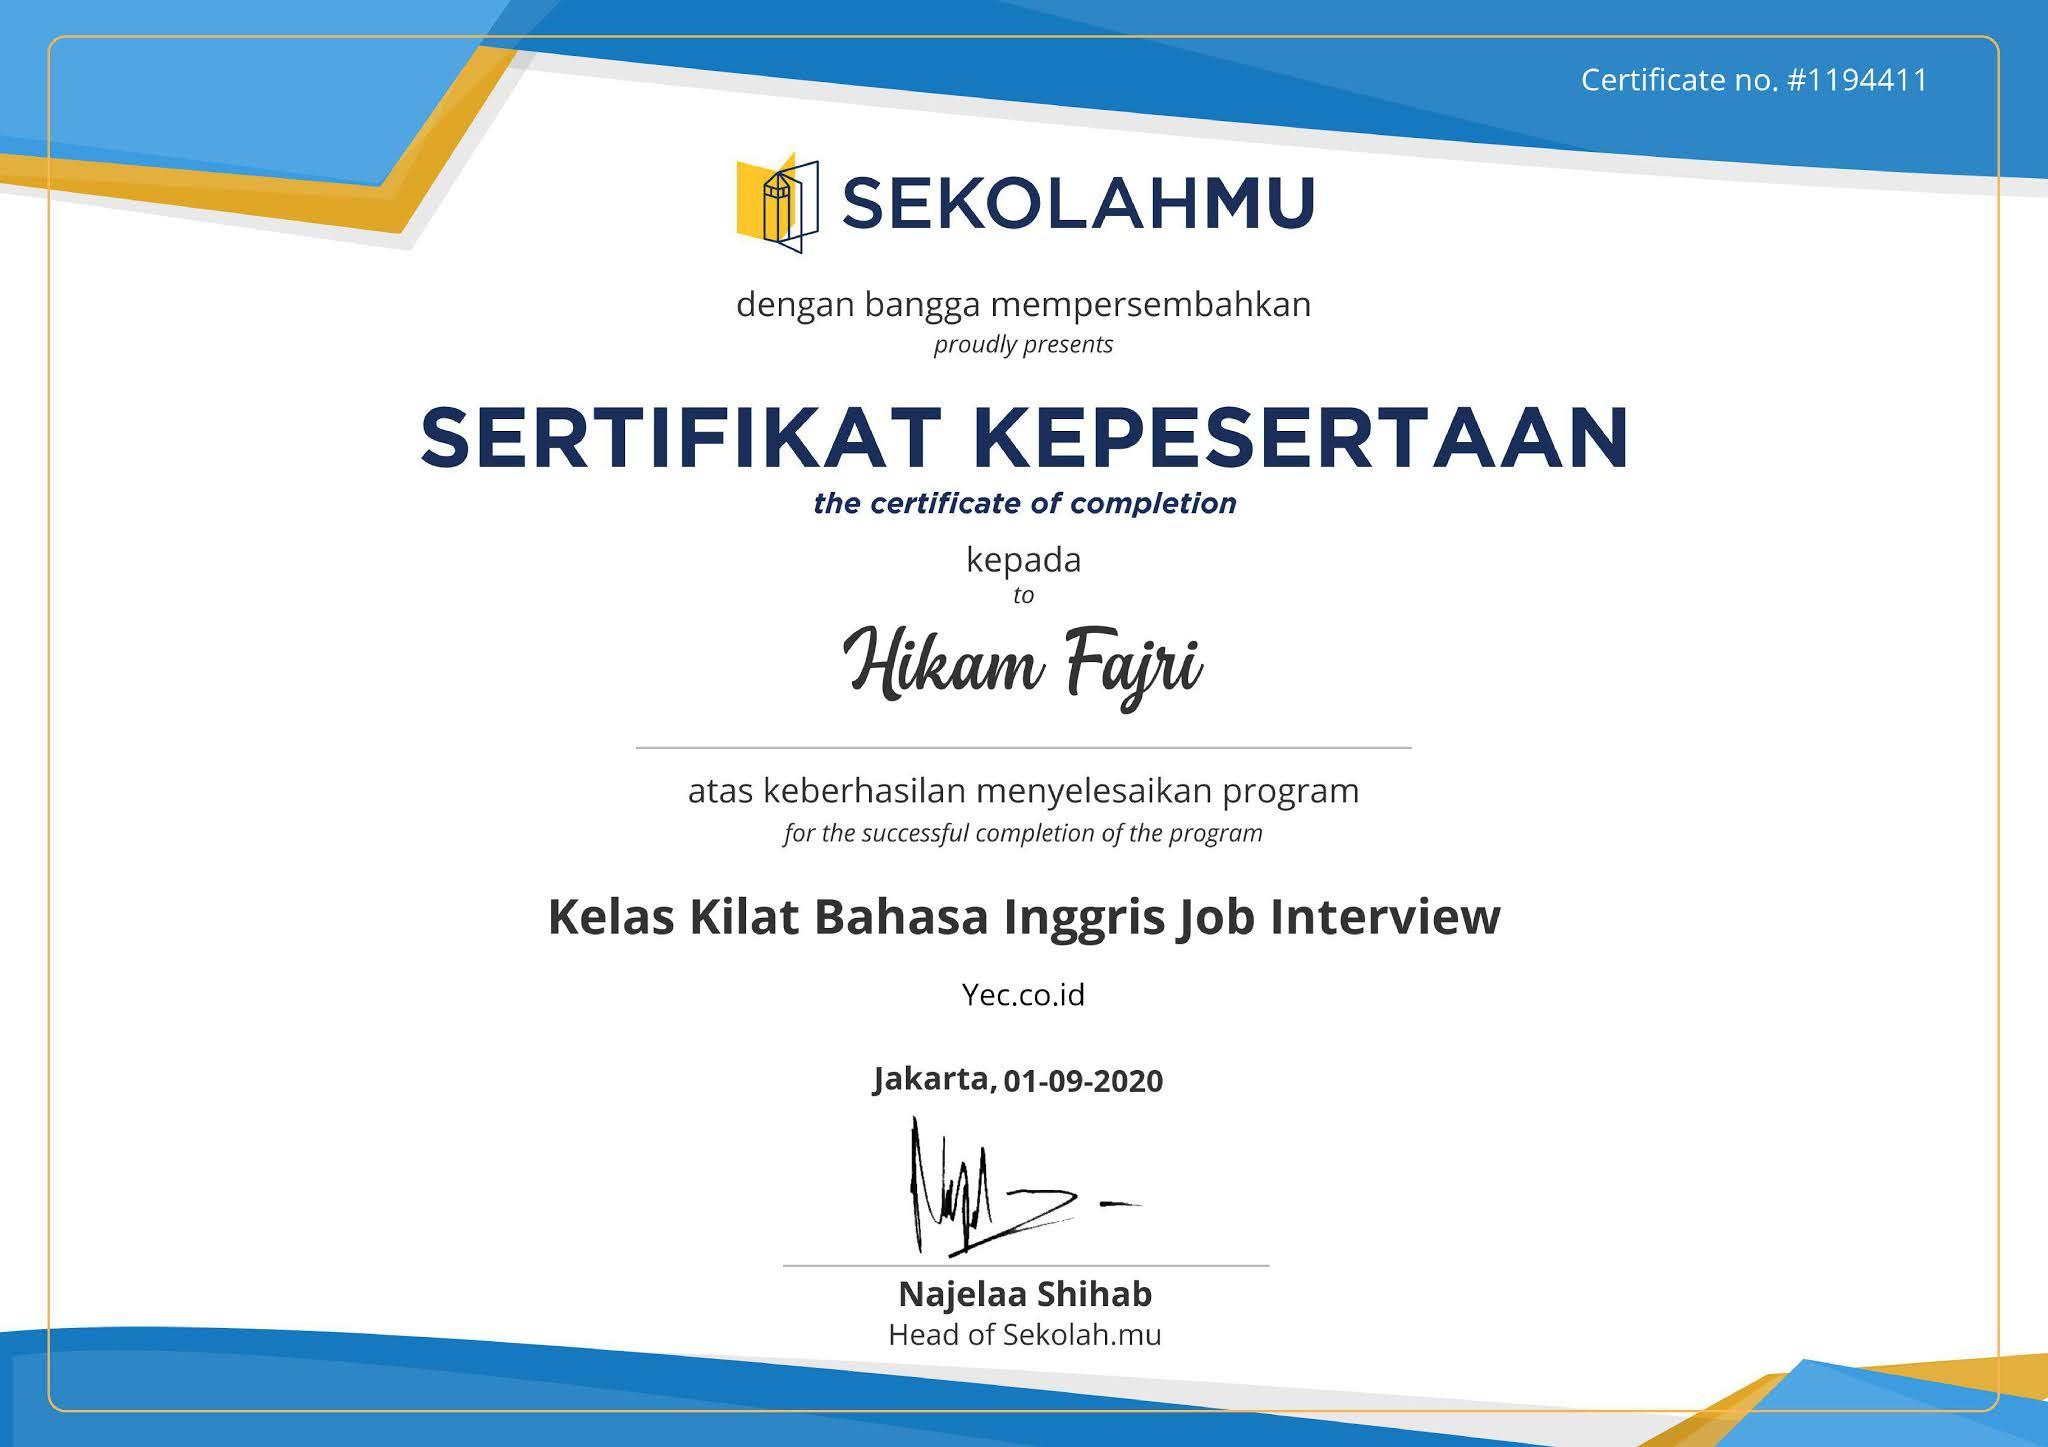 Kelas Kilat Bahasa Inggris Job Interview